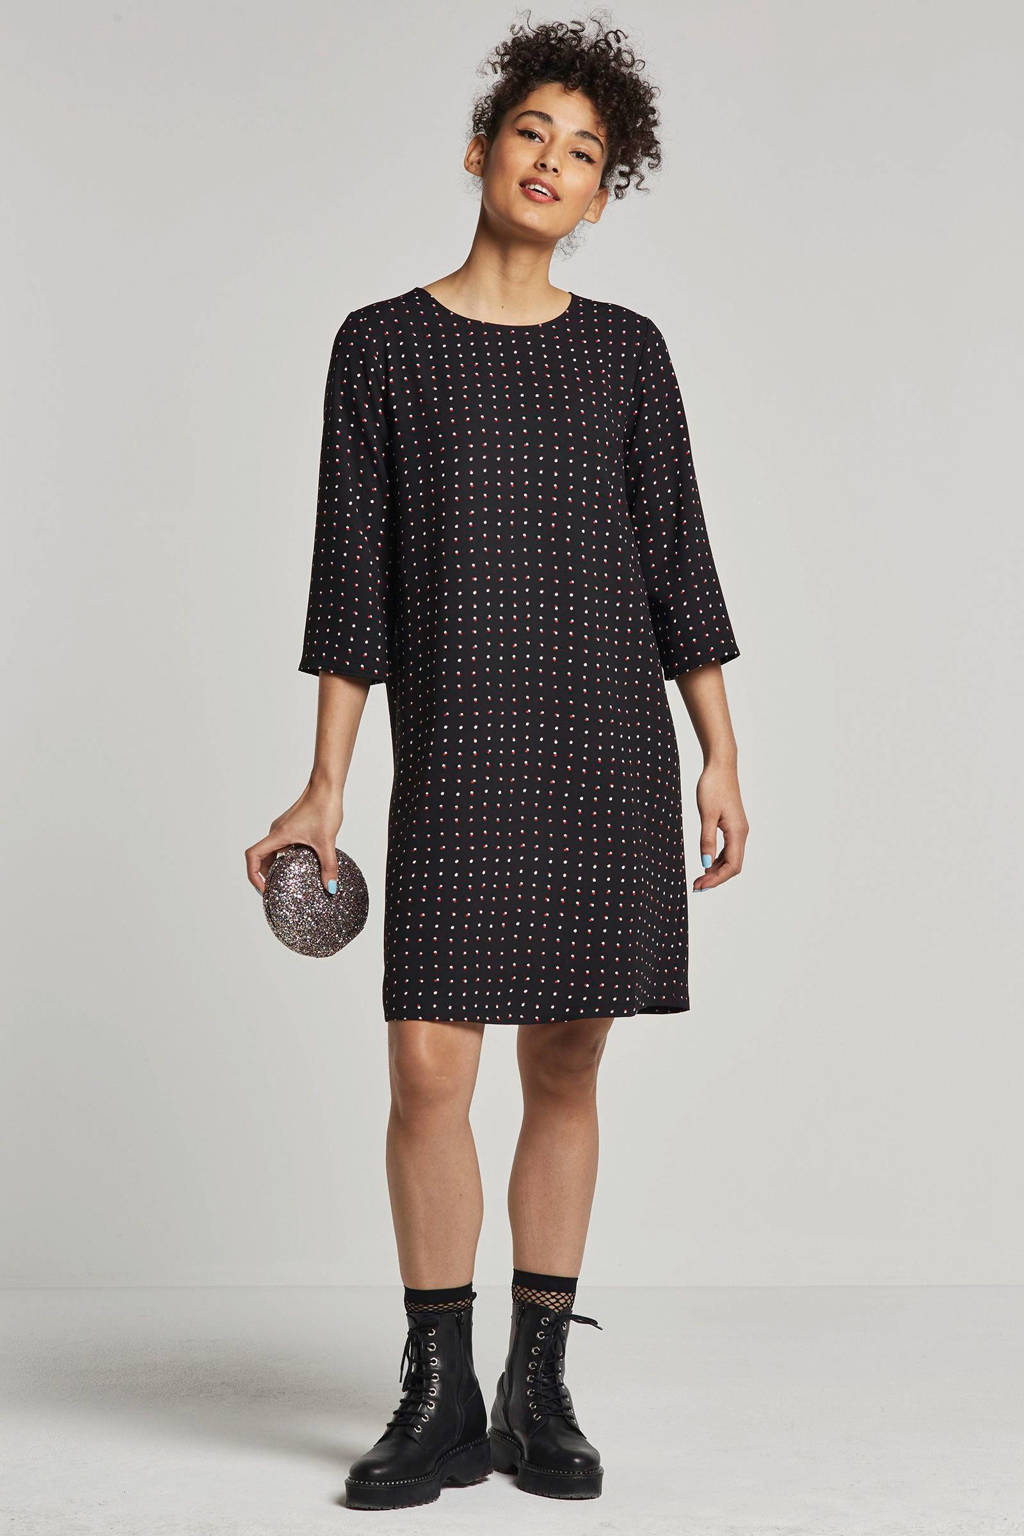 ONLY gestipte jurk, Zwart/wit/rood